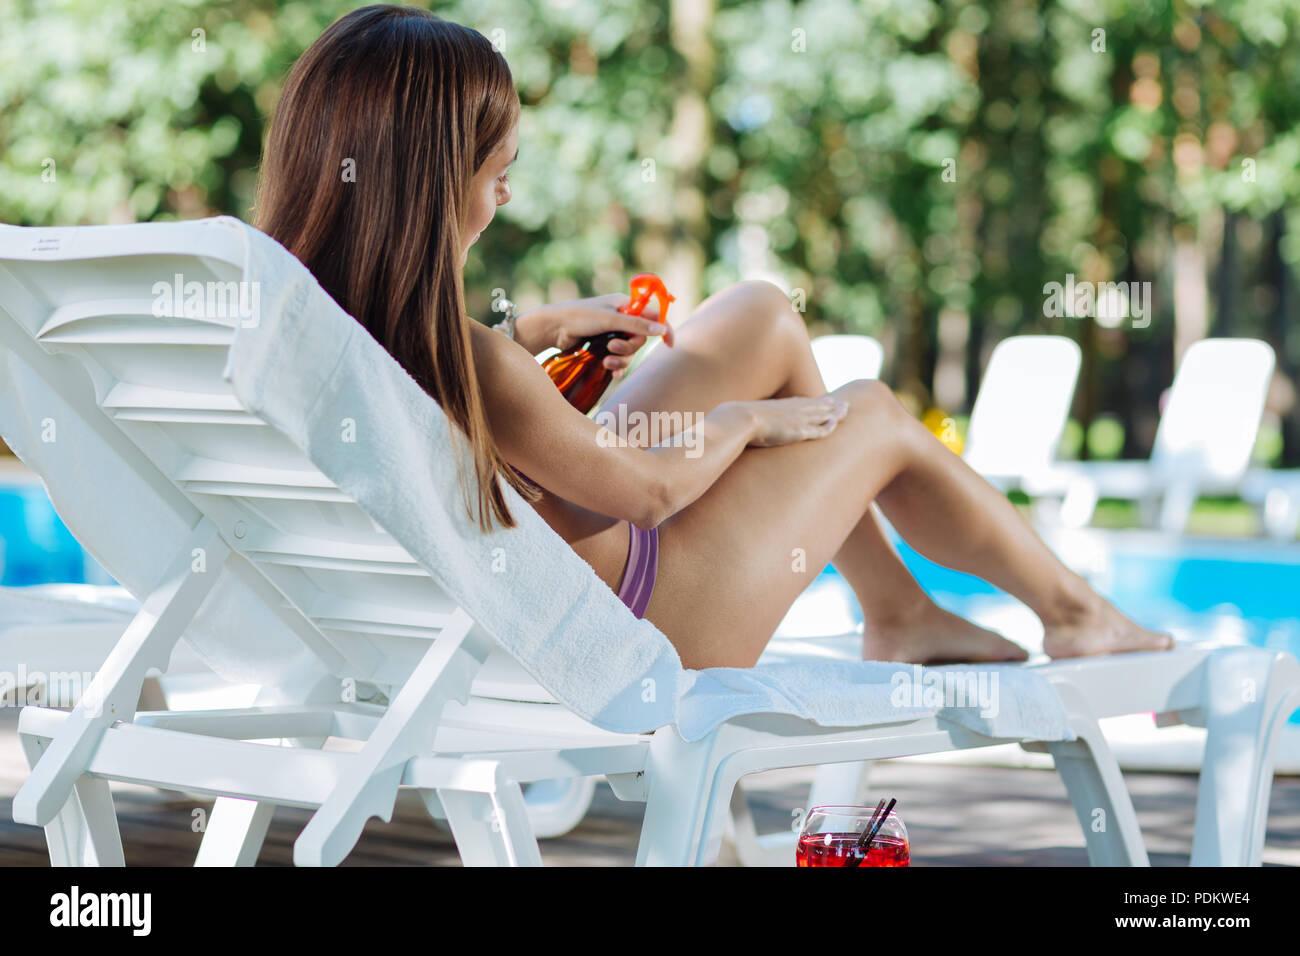 Slim successful model using sun protection cream - Stock Image